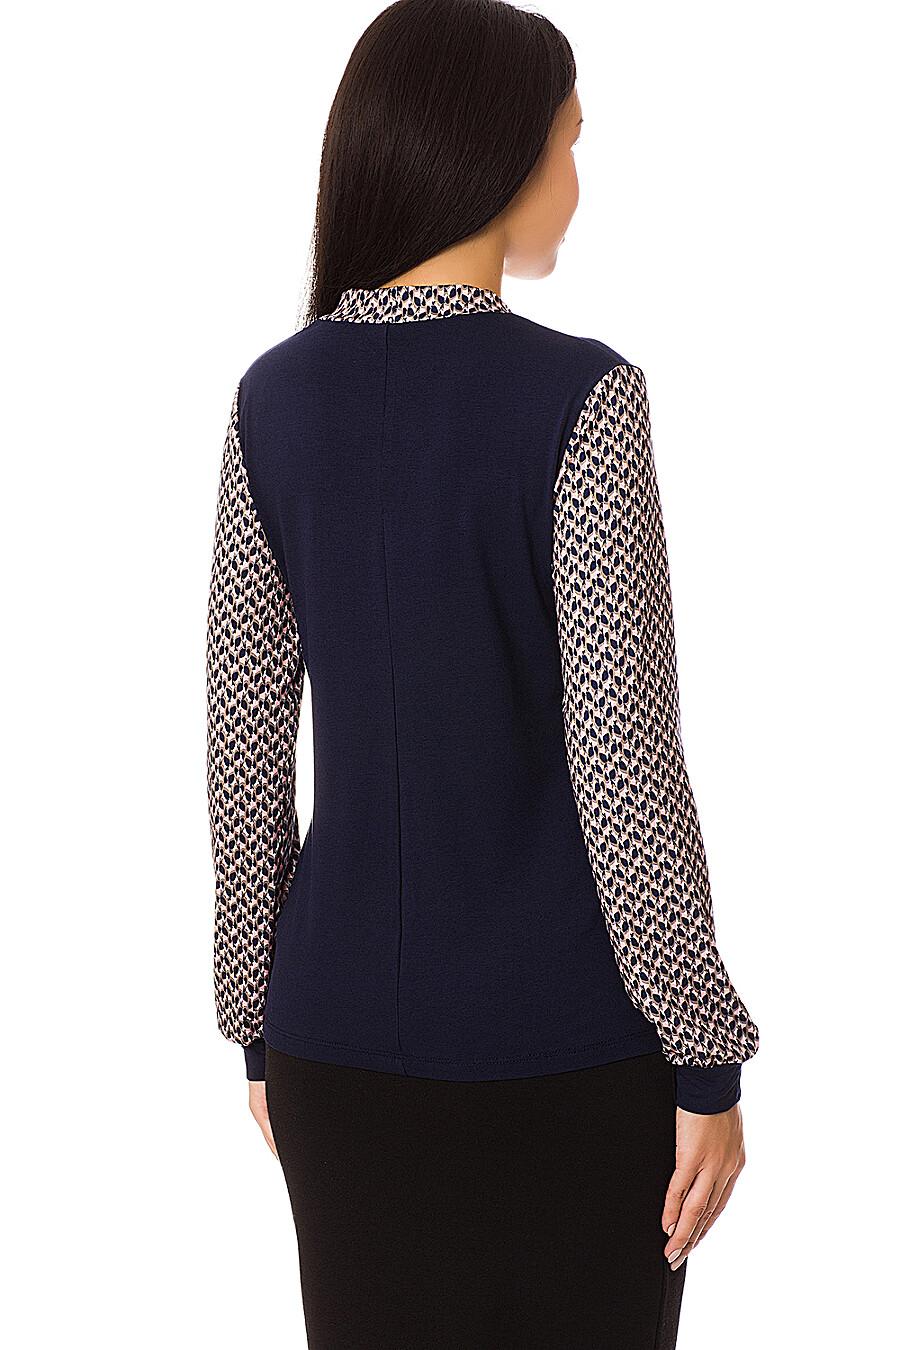 Блузка #66426